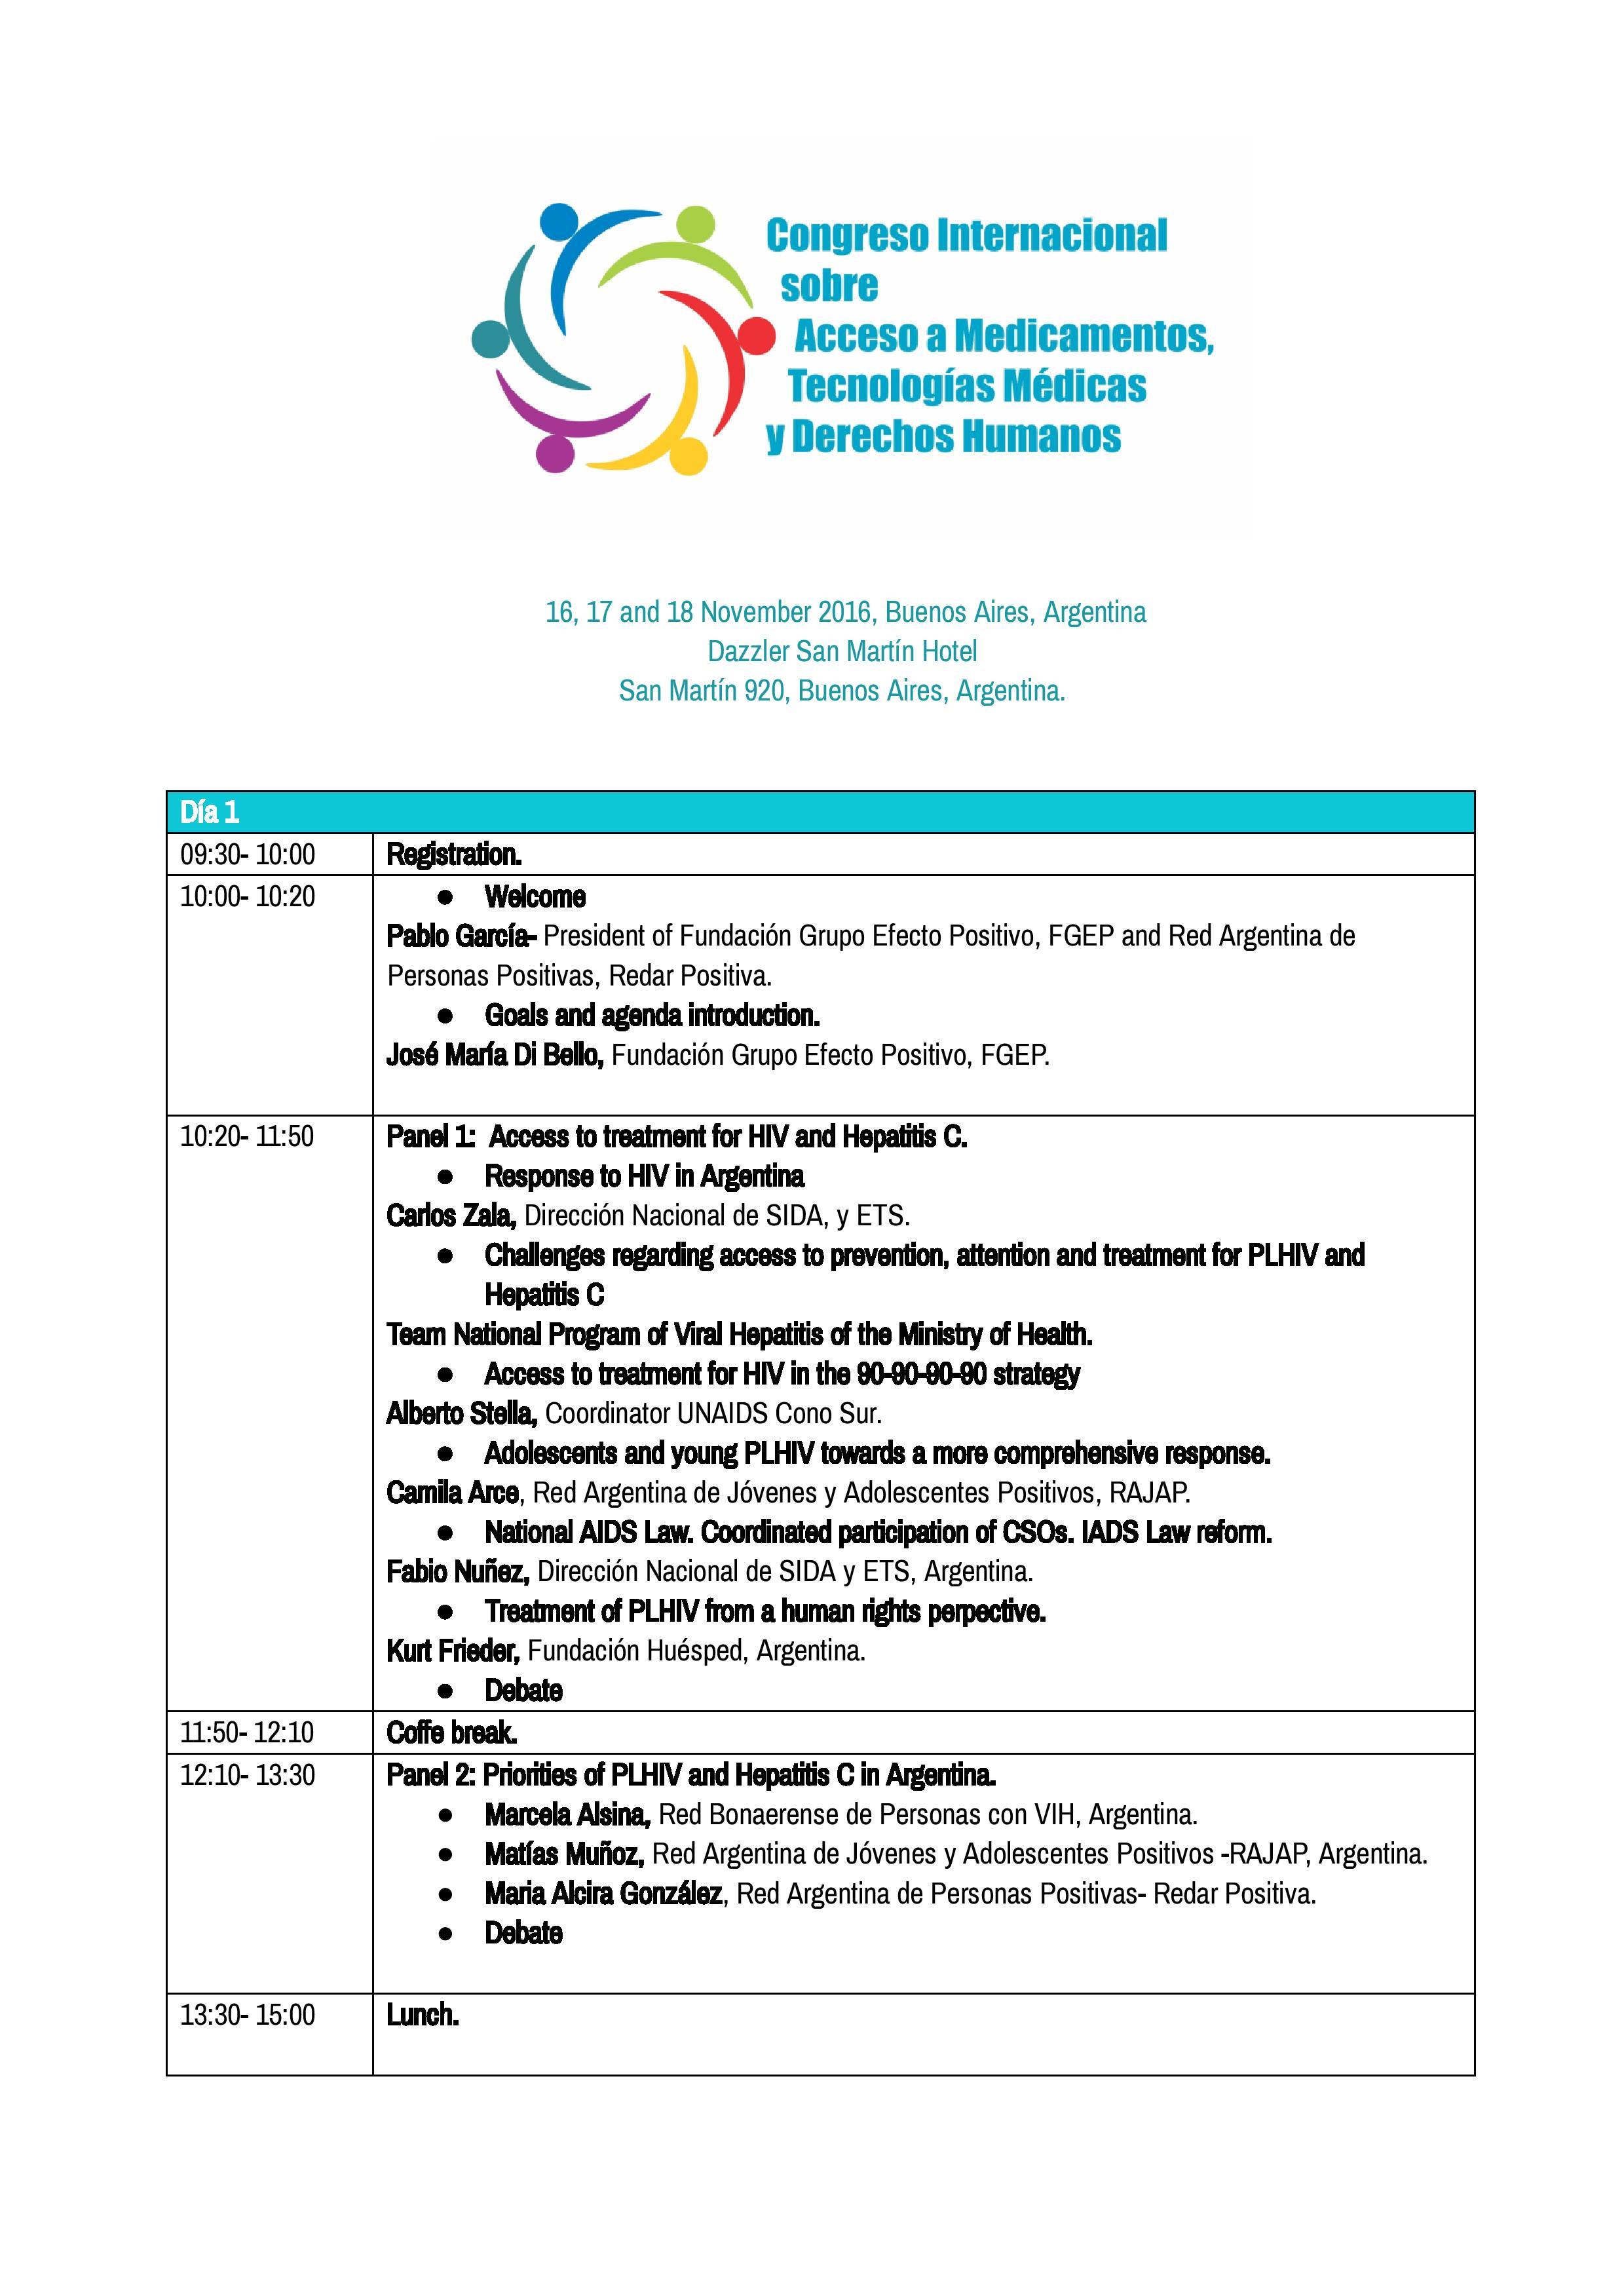 final-agenda-international-congress-print-docx_1479083532315-page-001